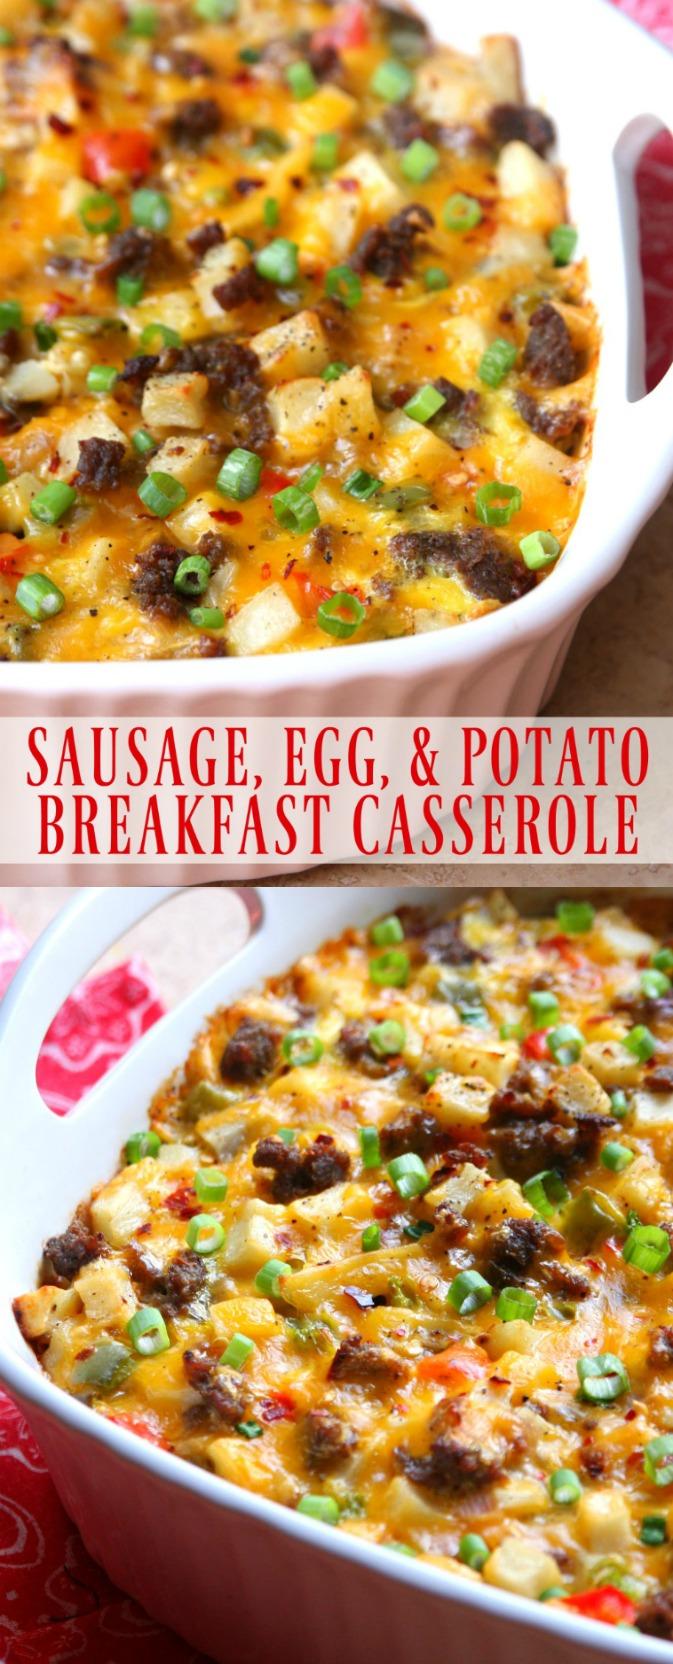 Sausage Egg Potato Breakfast Casserole